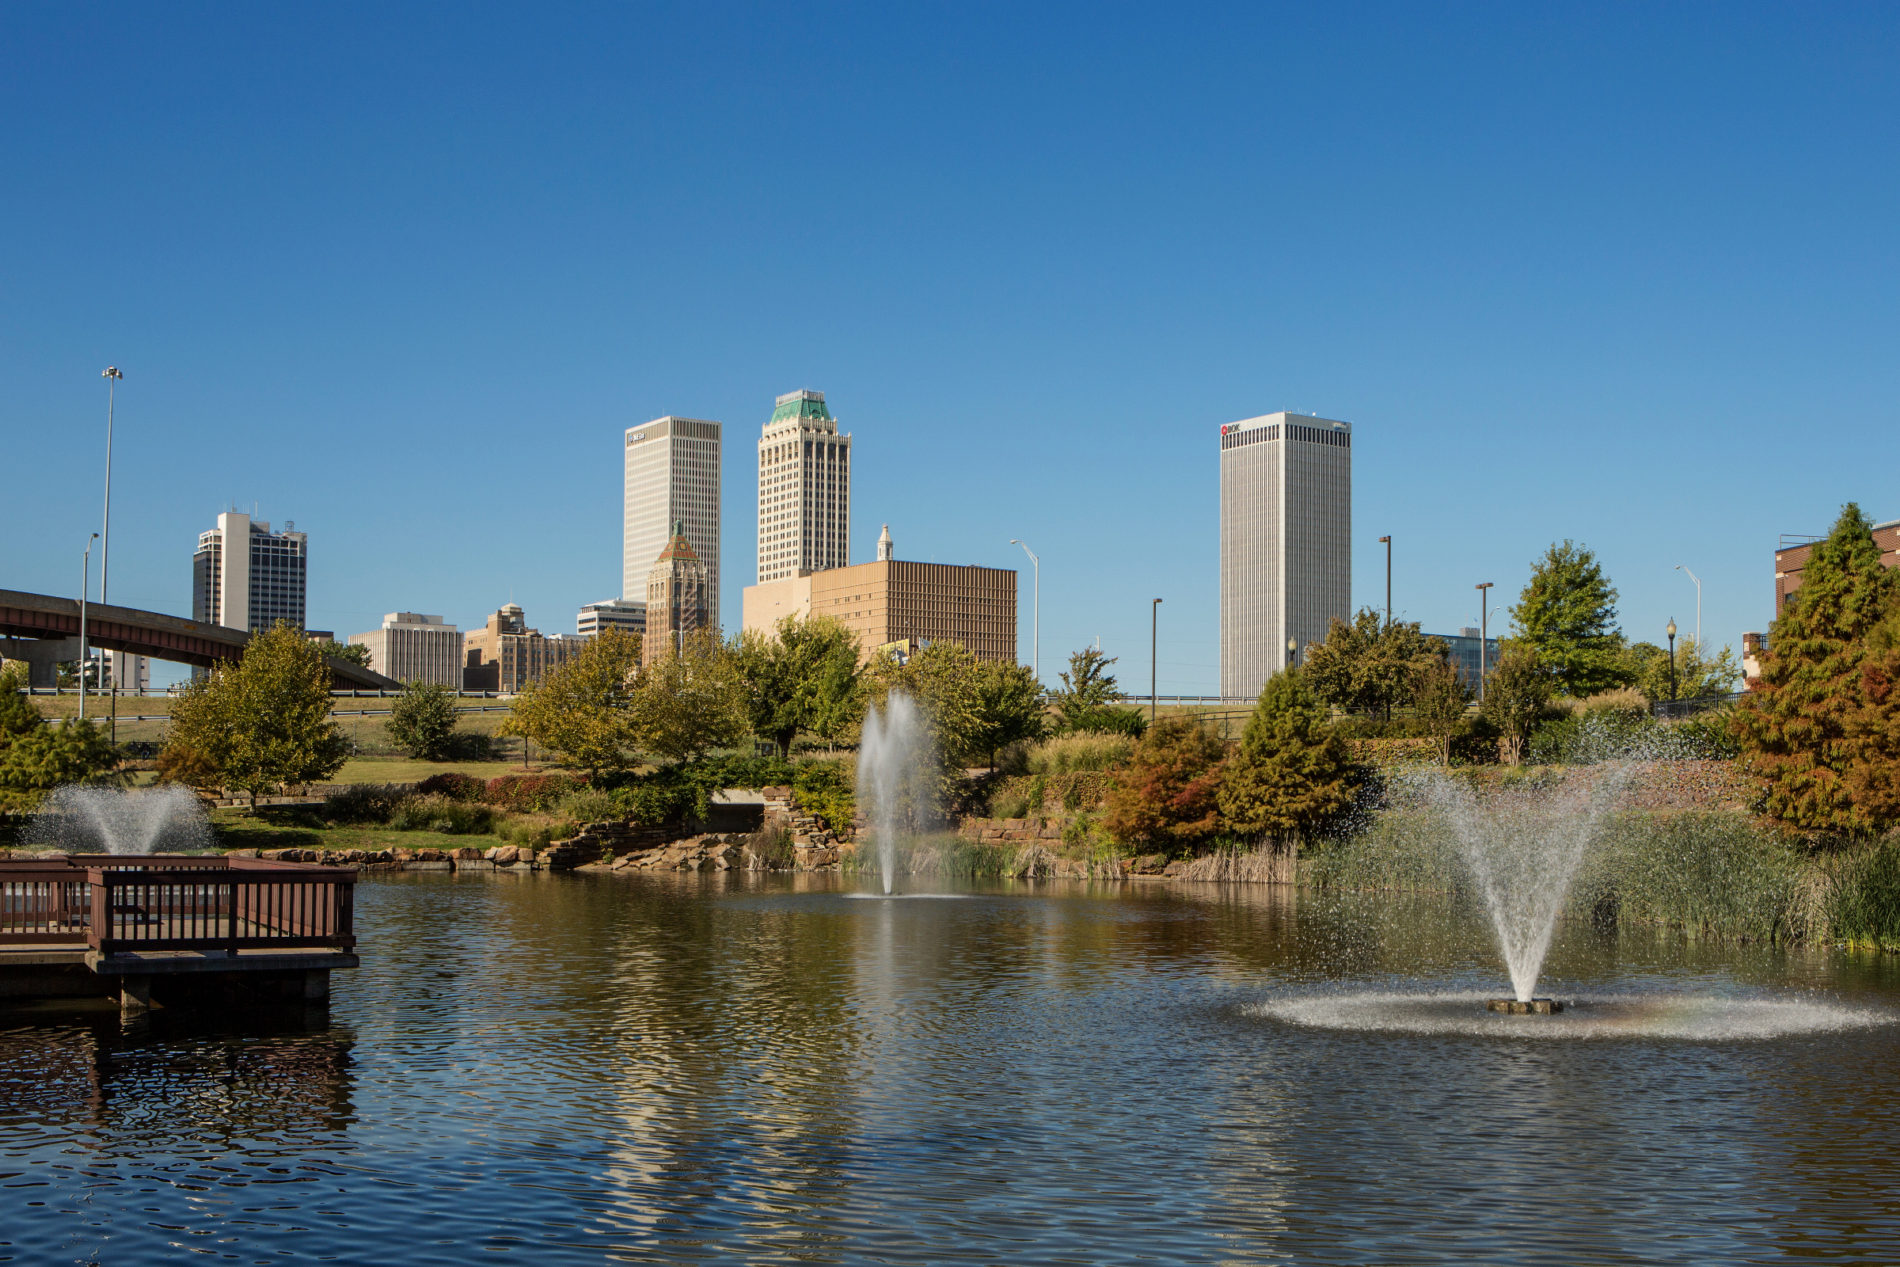 Centennial park pond Tulsa